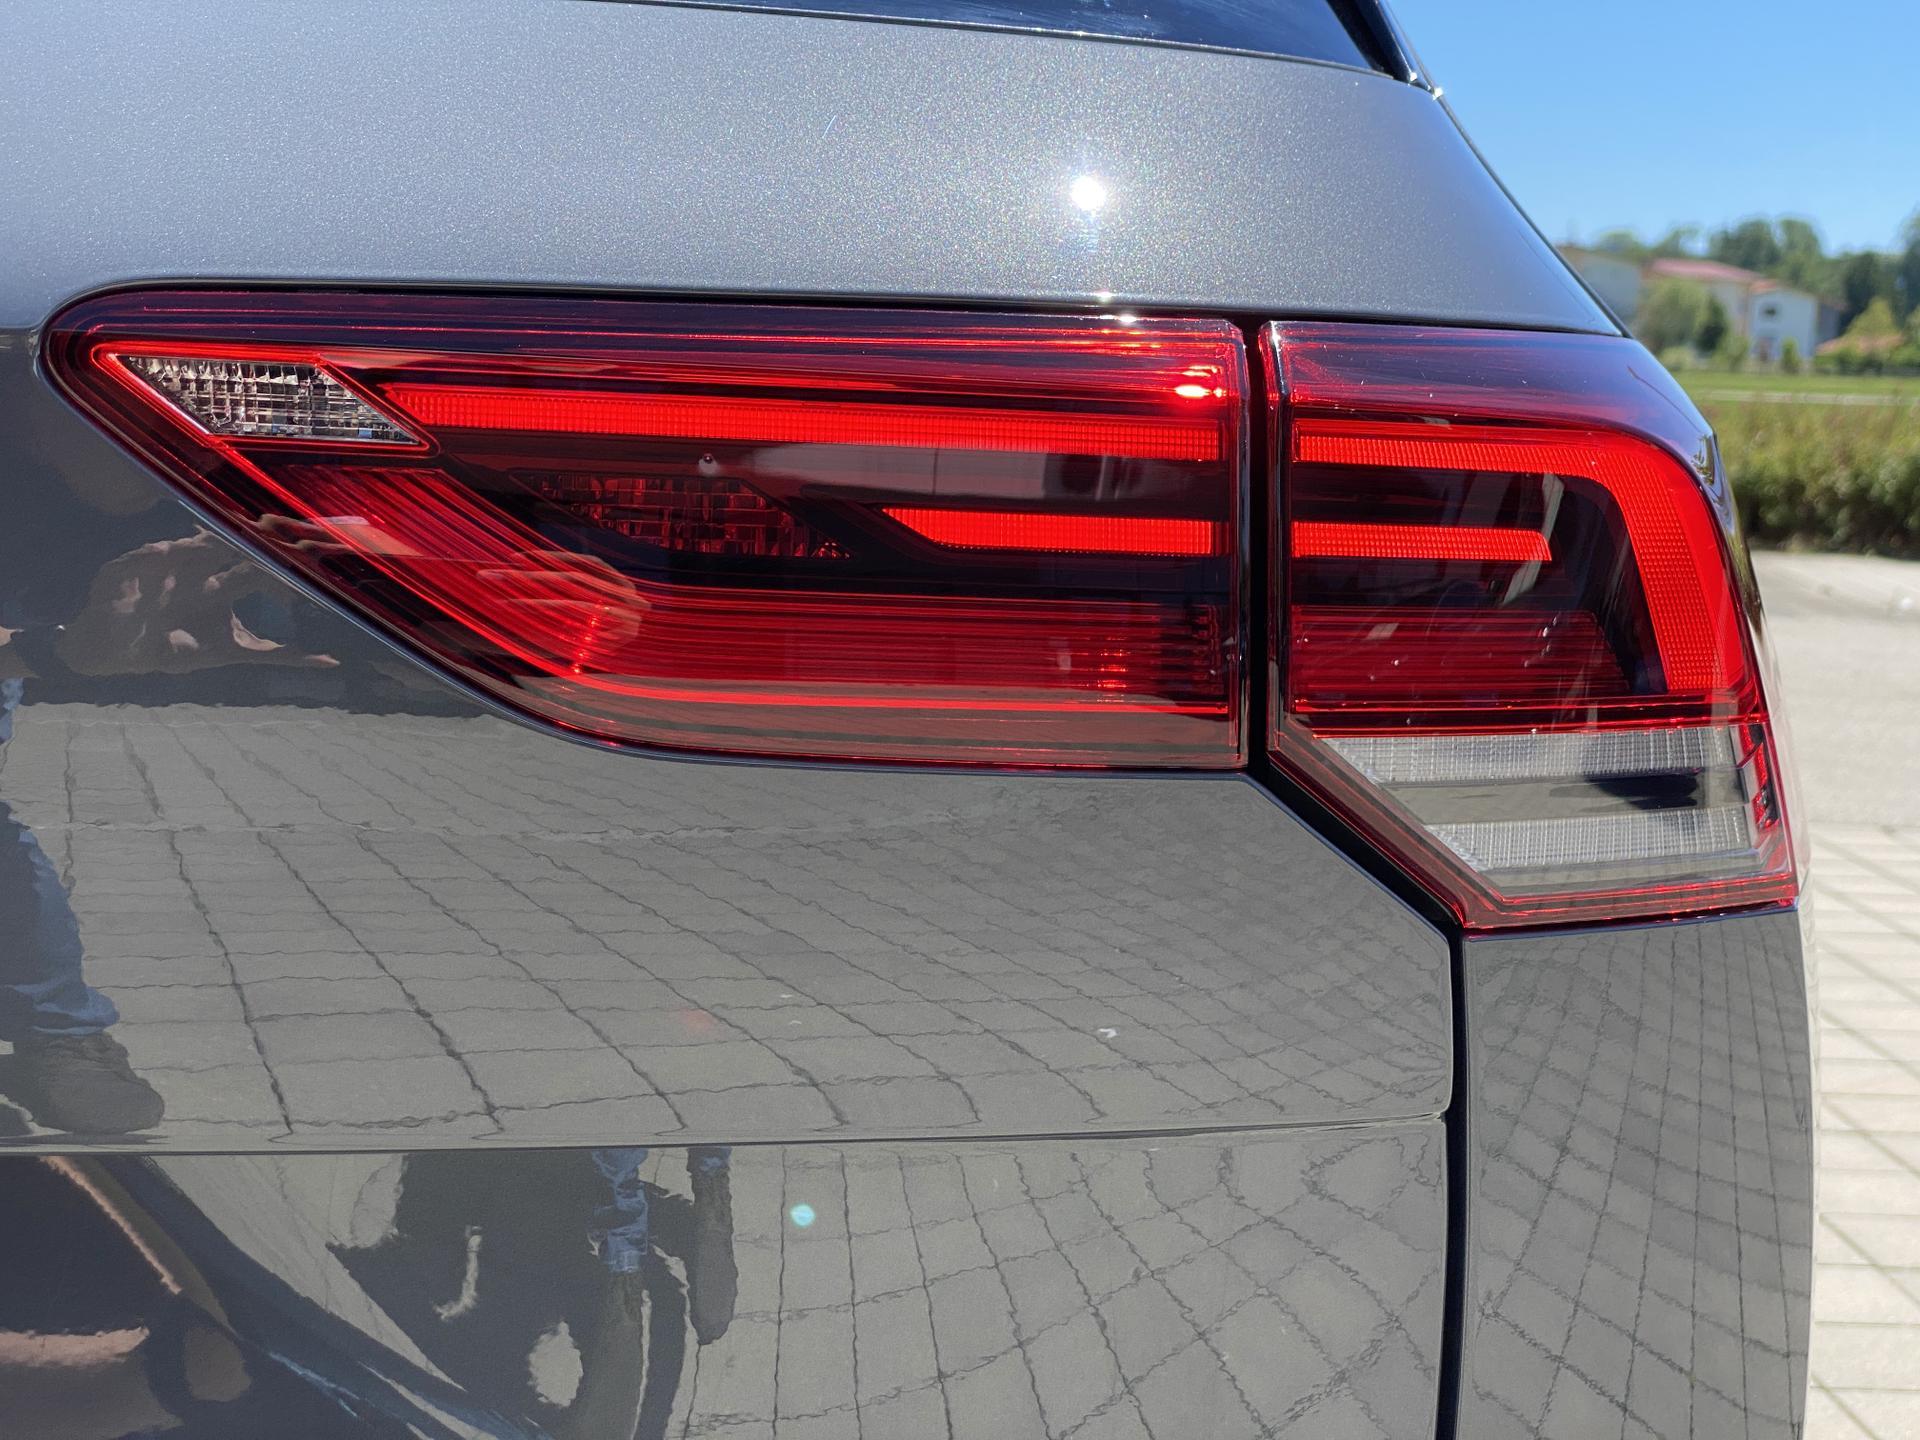 VW Golf Variant Rückleuchte